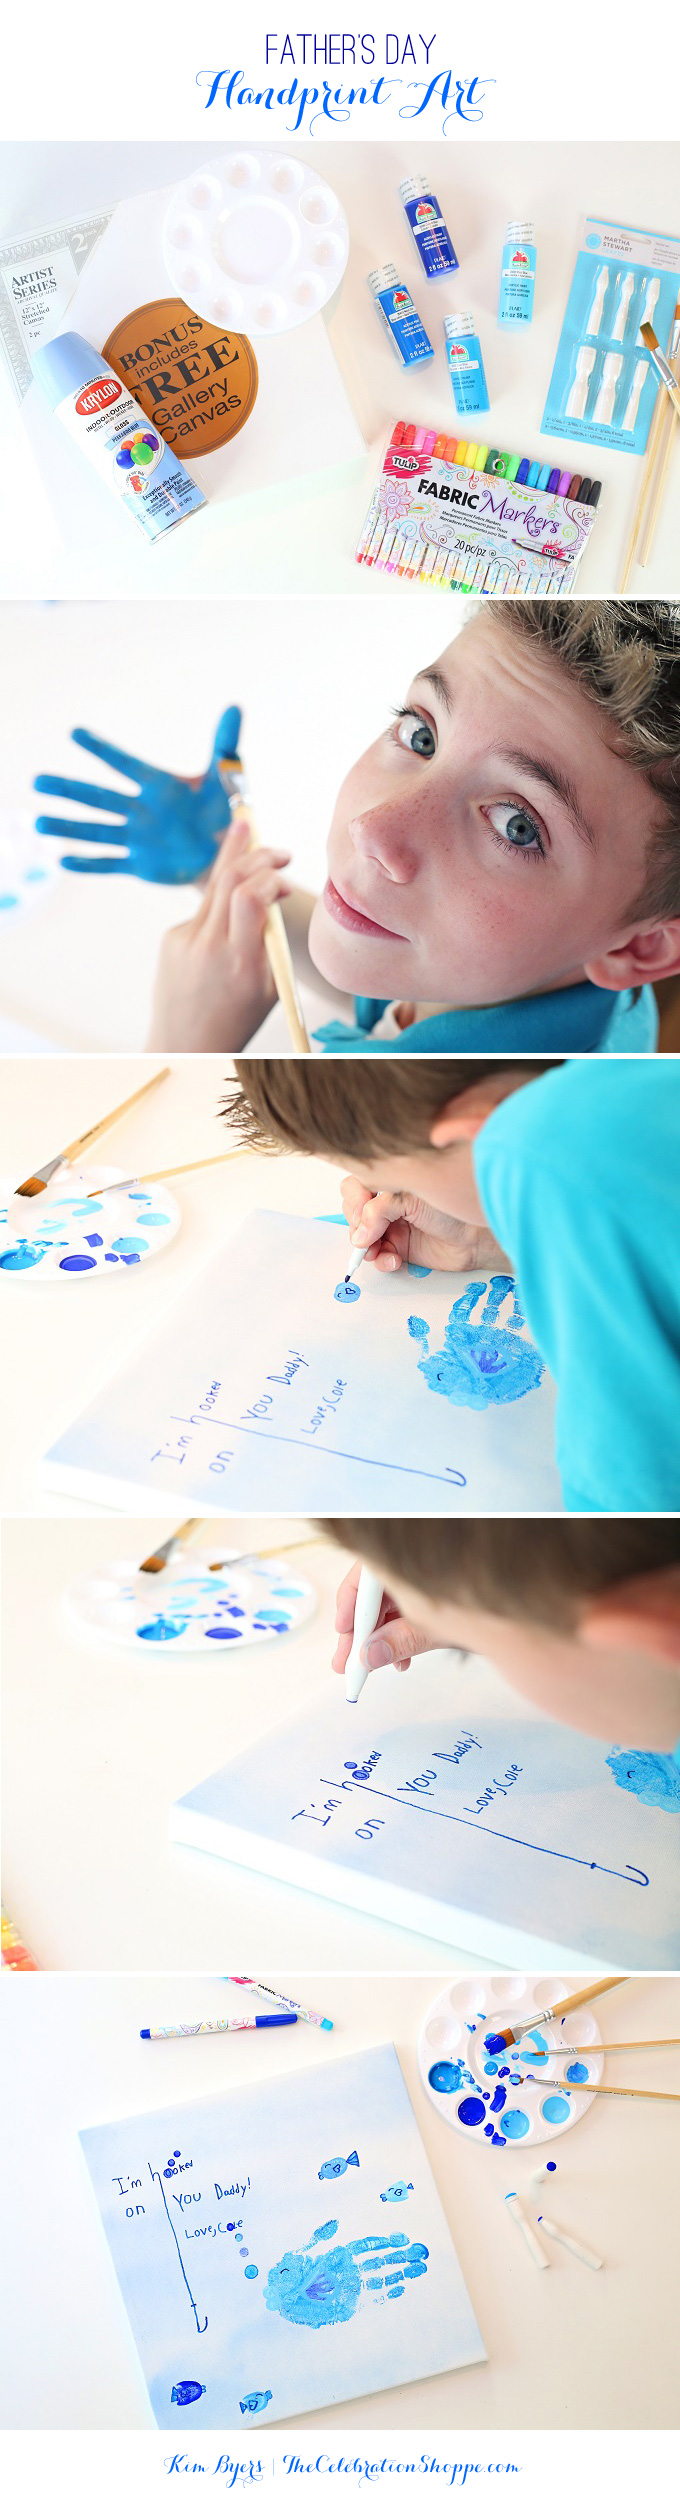 Fathers Day Fish Handprint Art Tutorial   Kim Byers